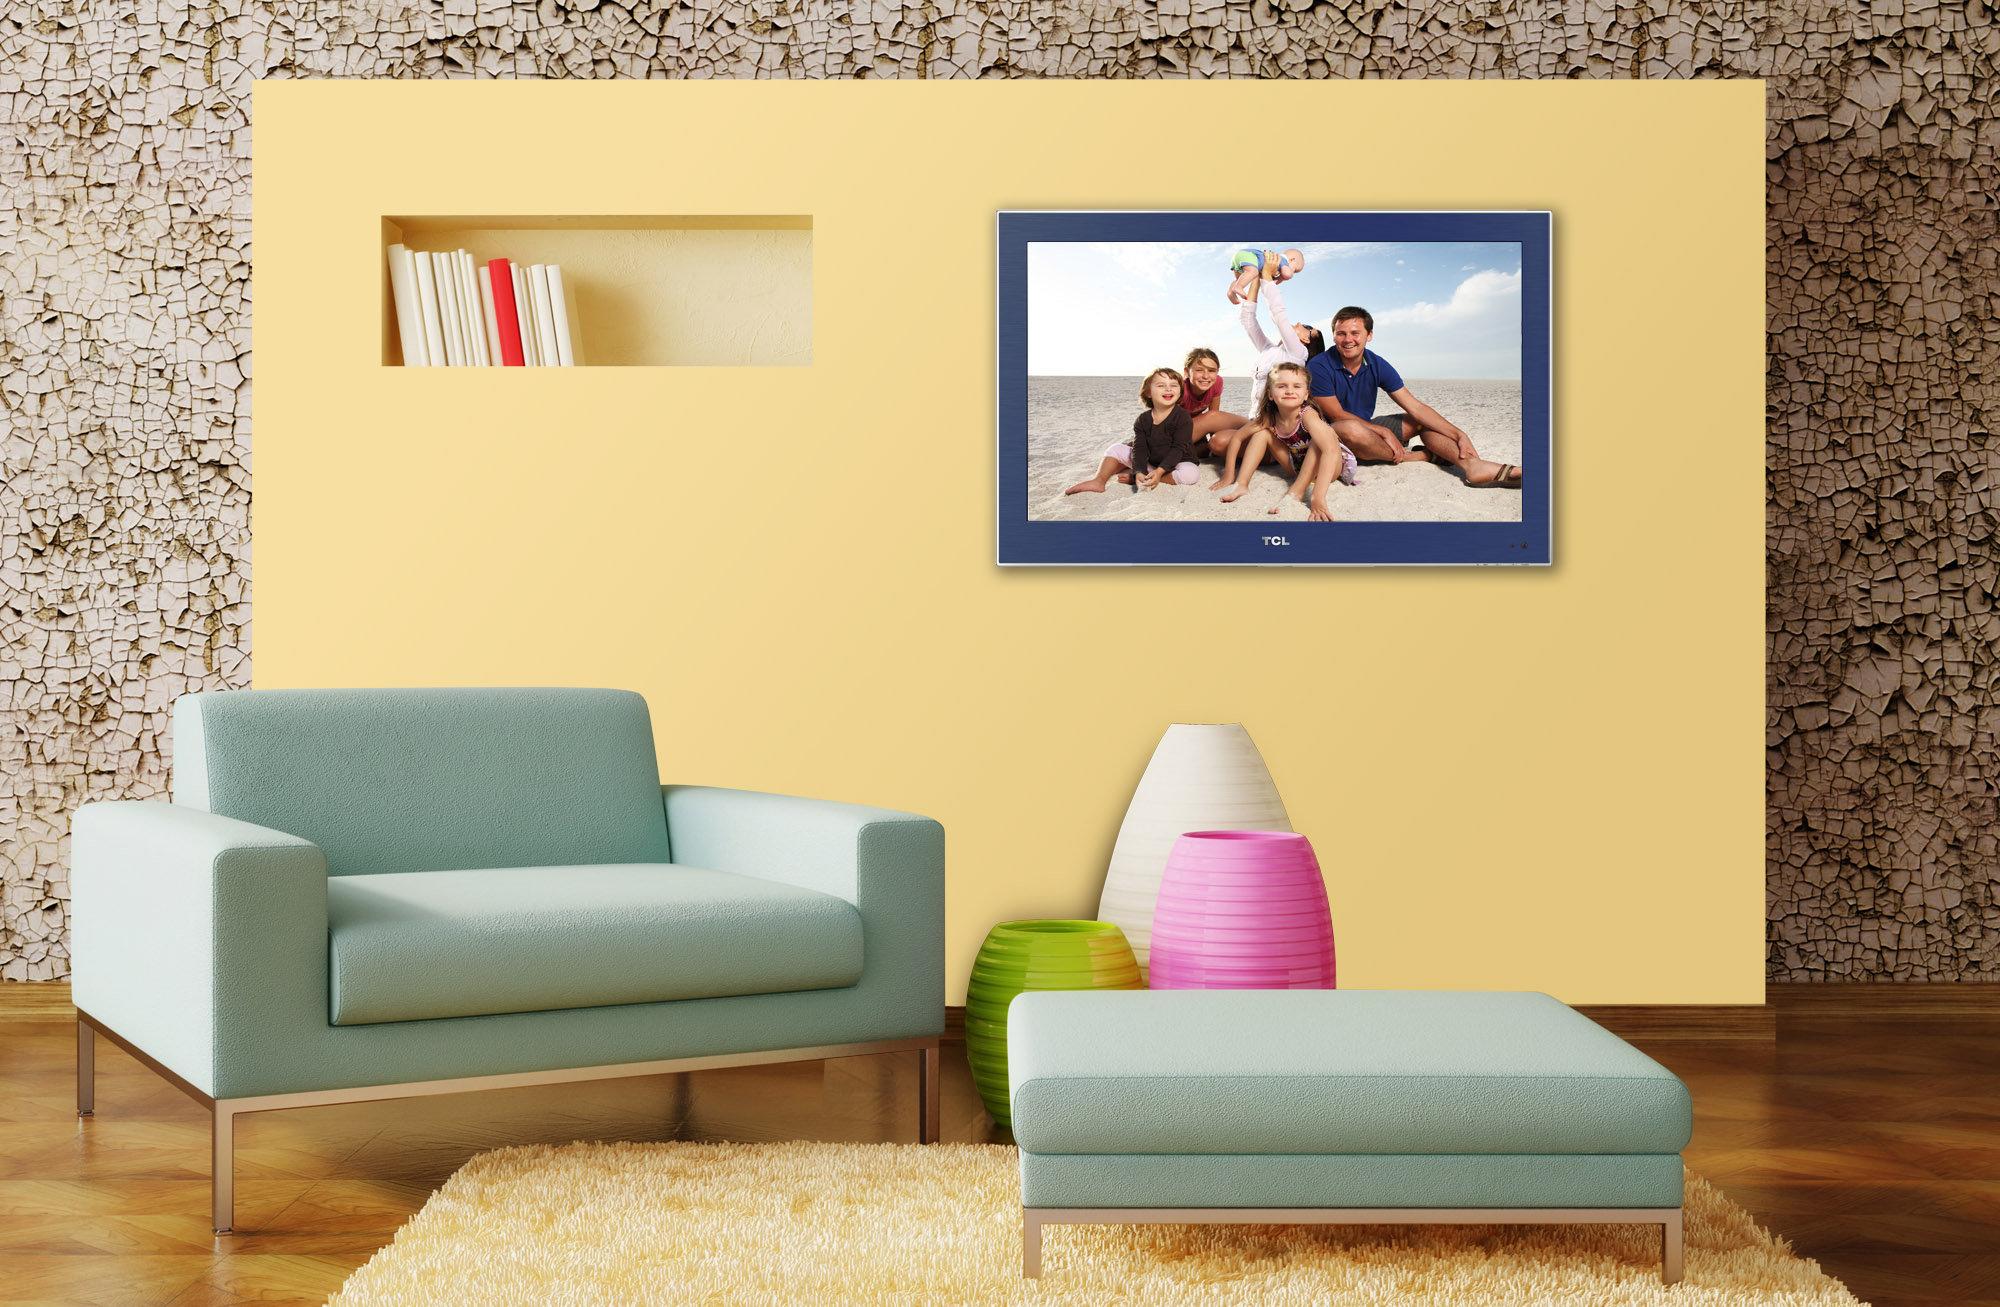 tcl l24e3130fc 61 cm 24 zoll fernseher full hd twin tuner heimkino tv video. Black Bedroom Furniture Sets. Home Design Ideas